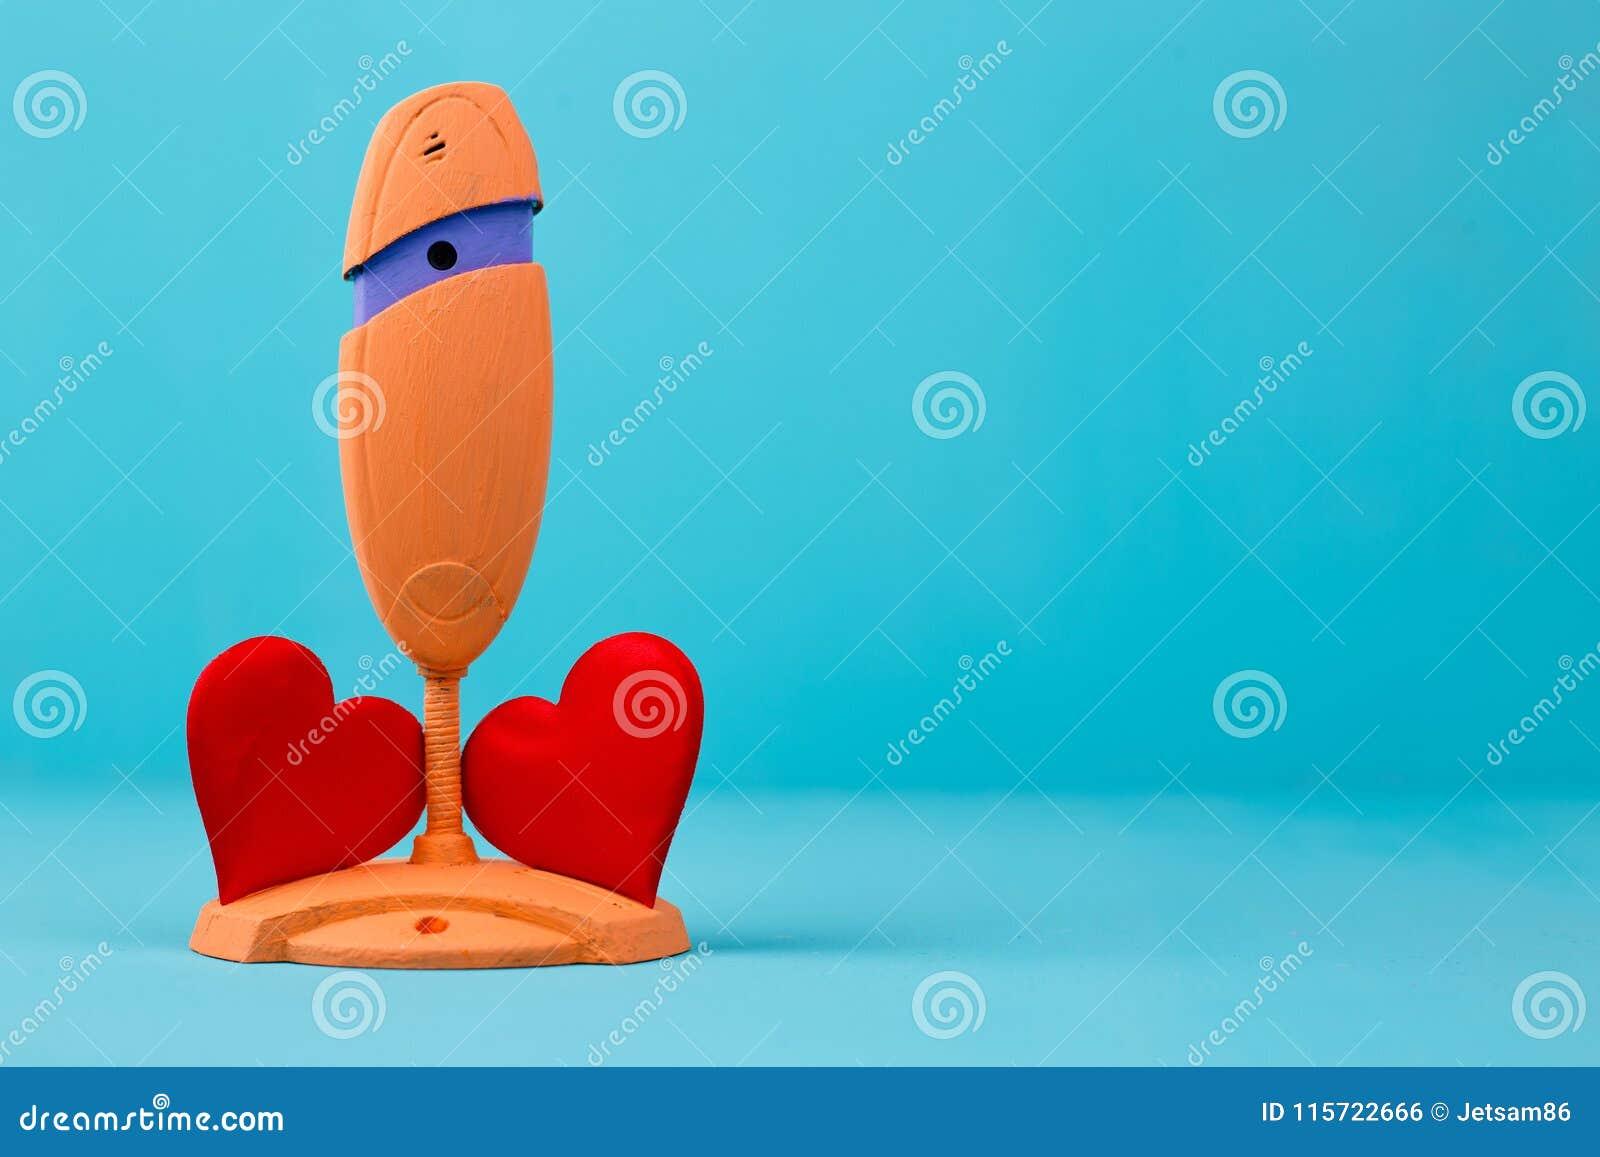 On-line χρονολογώντας, έννοια συνομιλίας αγάπης Ιστός-κάμερα και κόκκινο ύφασμα δύο